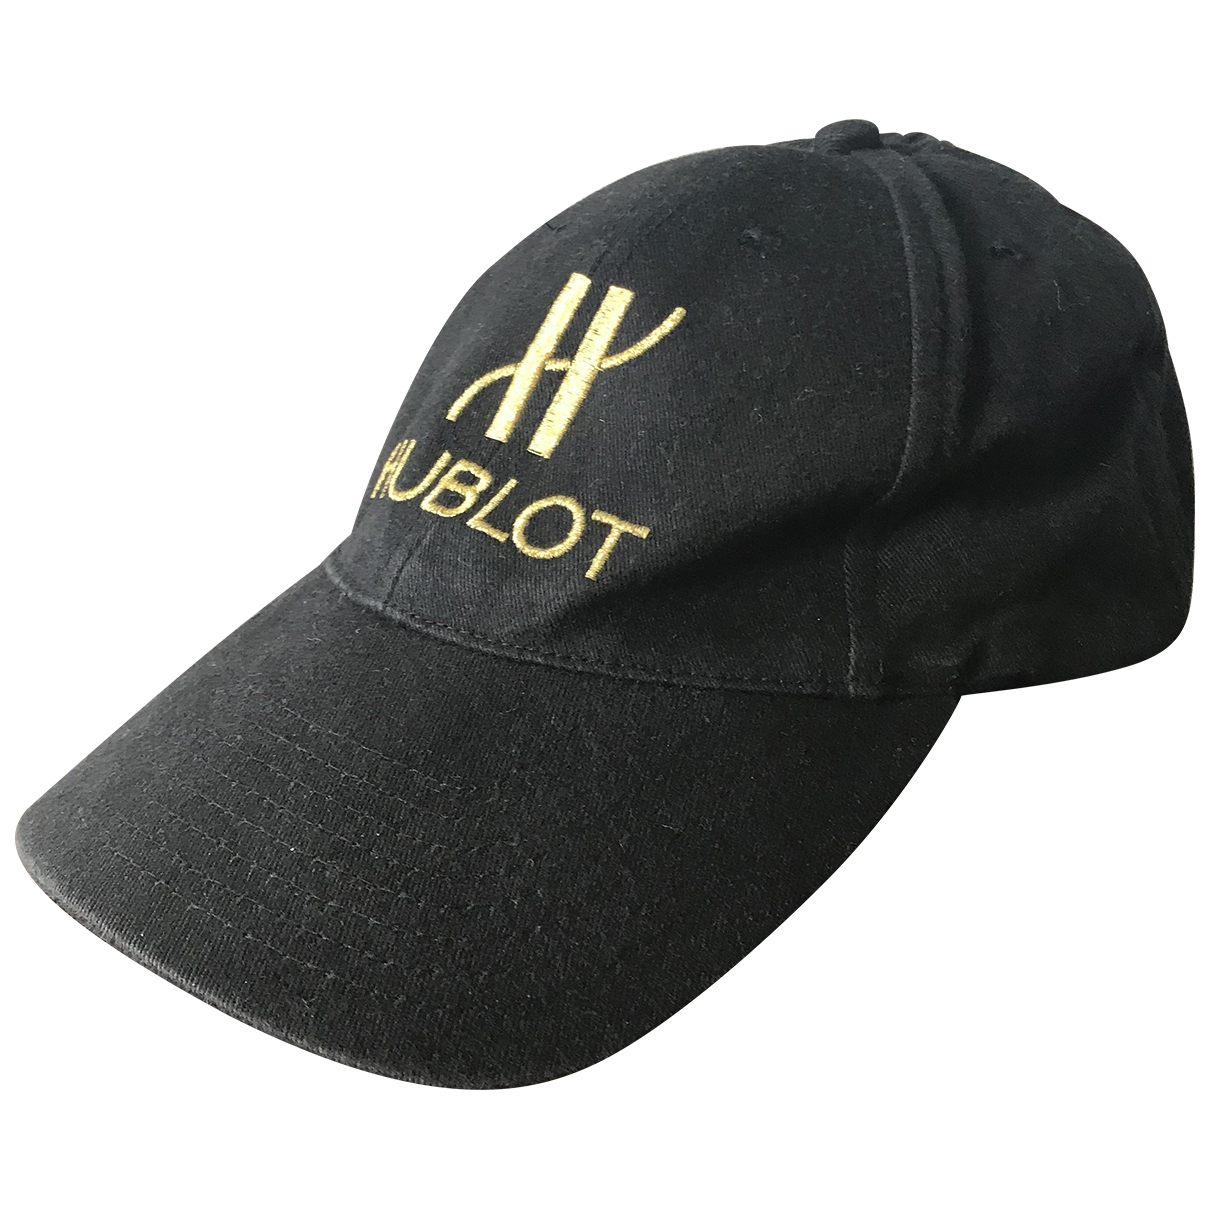 Hublot \N Black Cotton hat & pull on hat for Men 56 cm